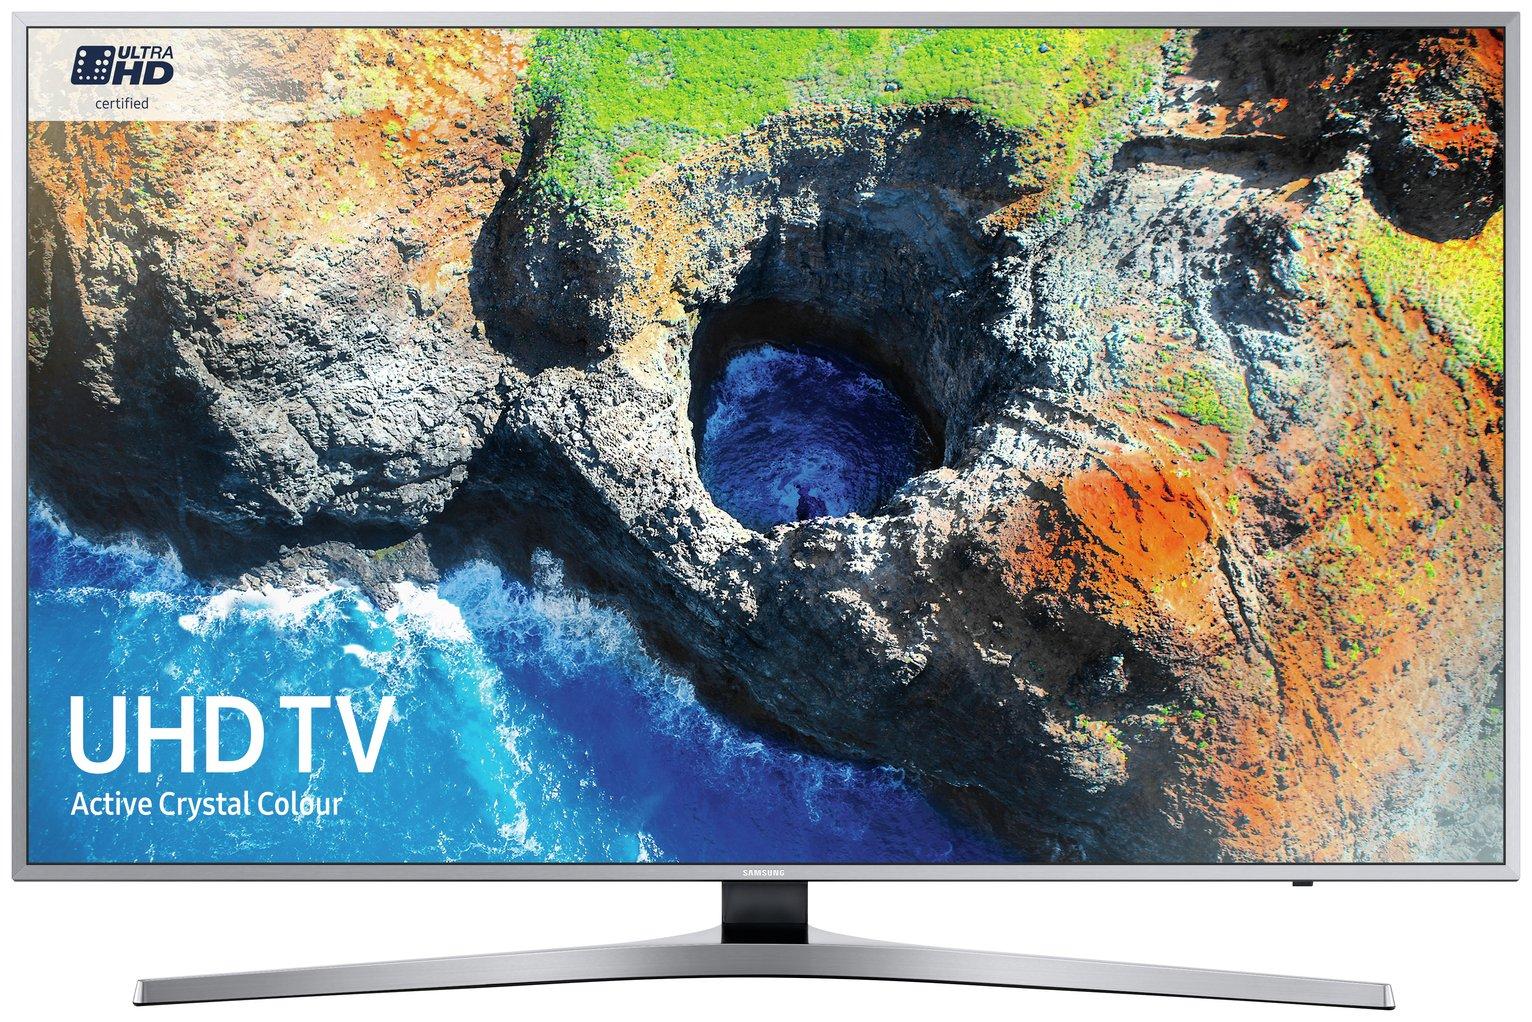 Samsung 49MU6400 49 Inch 4K UHD Smart TV with HDR